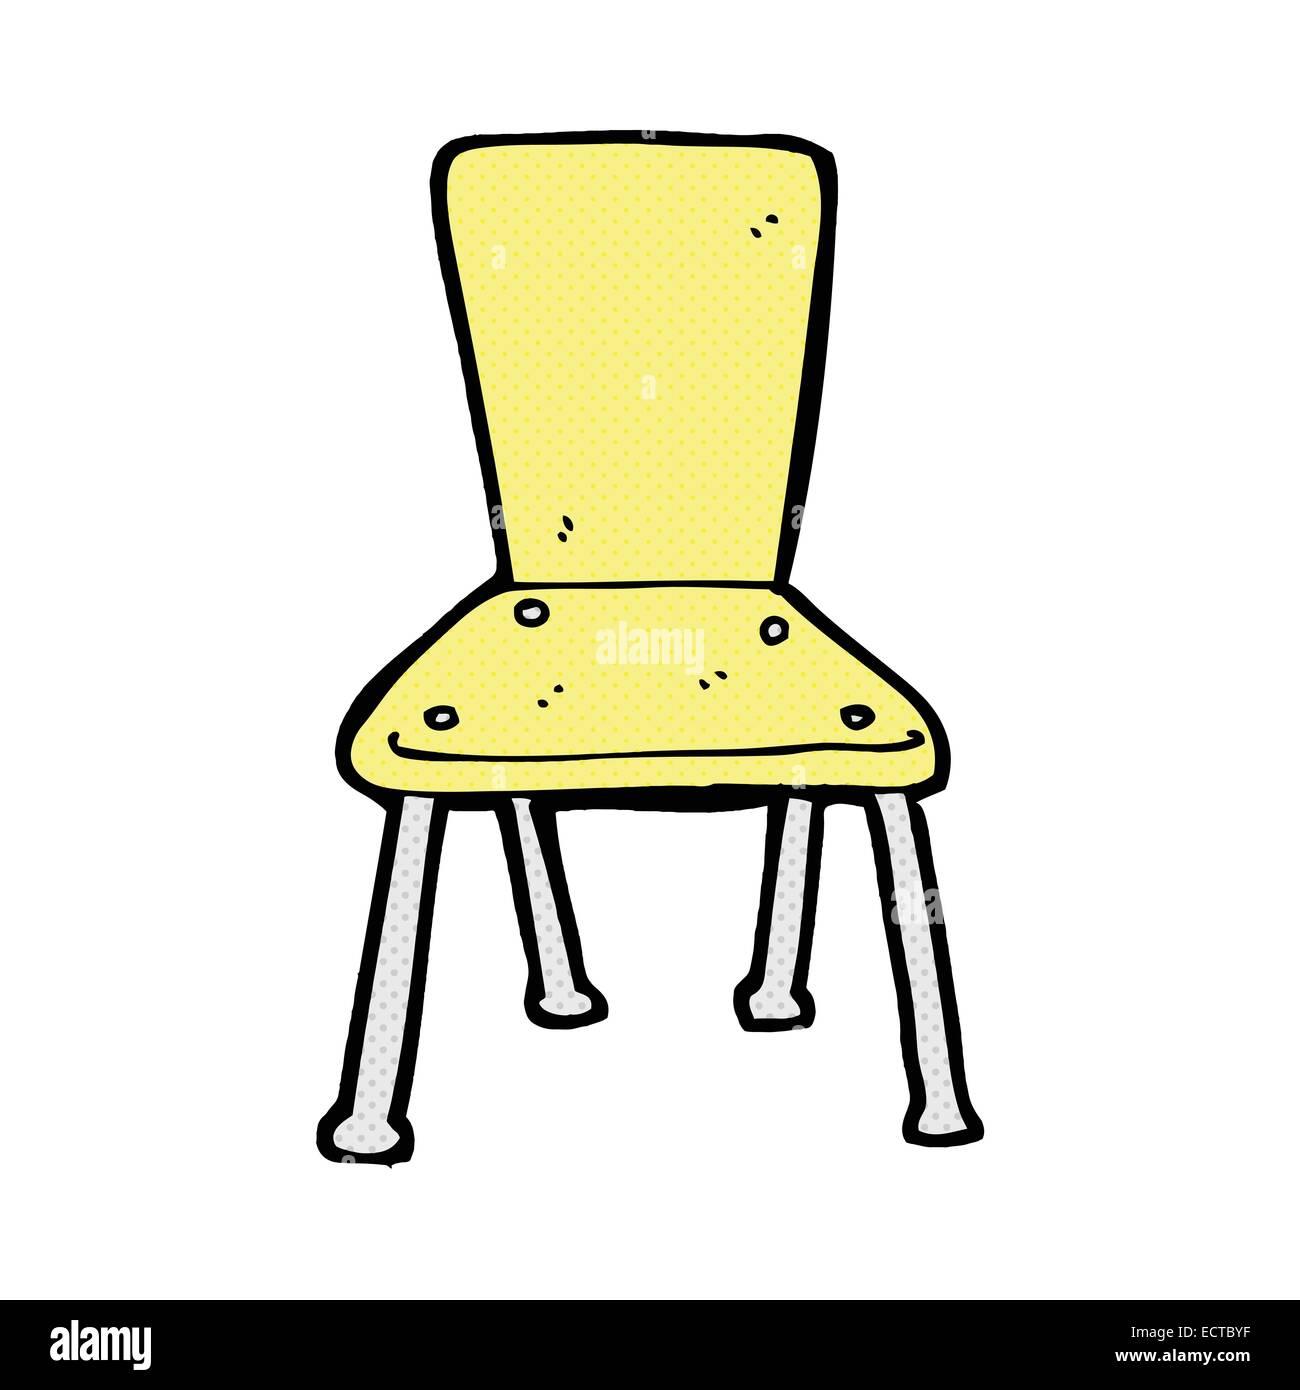 Retro Comic Book Style Cartoon Old School Chair Stock Vector